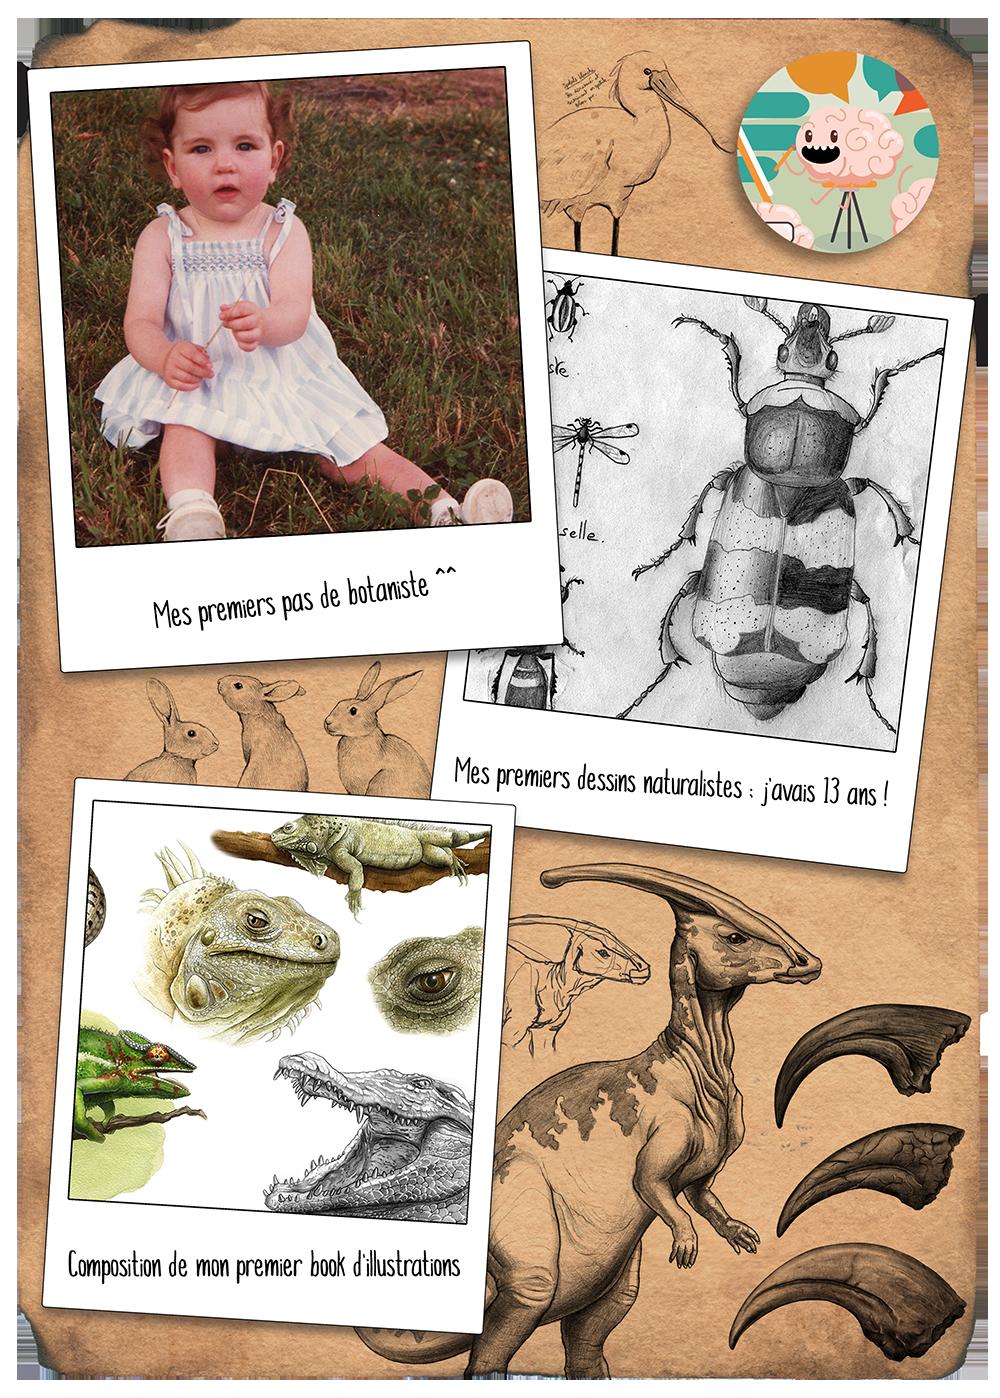 Ma vie d'illustratrice scientifique naturaliste sur ComSciComCa